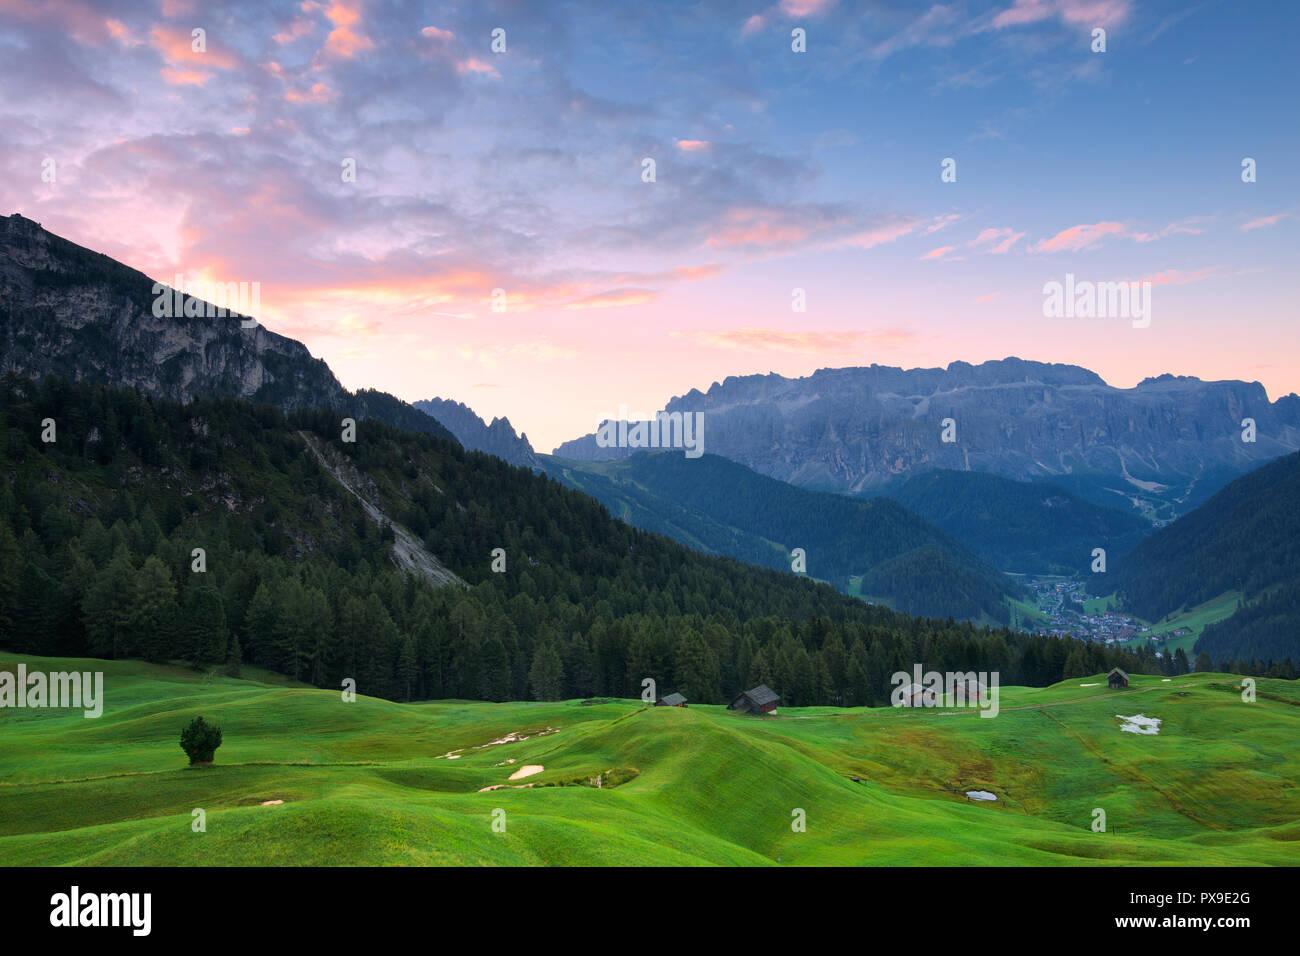 Sunrise in the pasture of Daunei. Selva Val Gardena, Gardena Valley, South Tyrol, Dolomites, Italy, Europe. Stock Photo